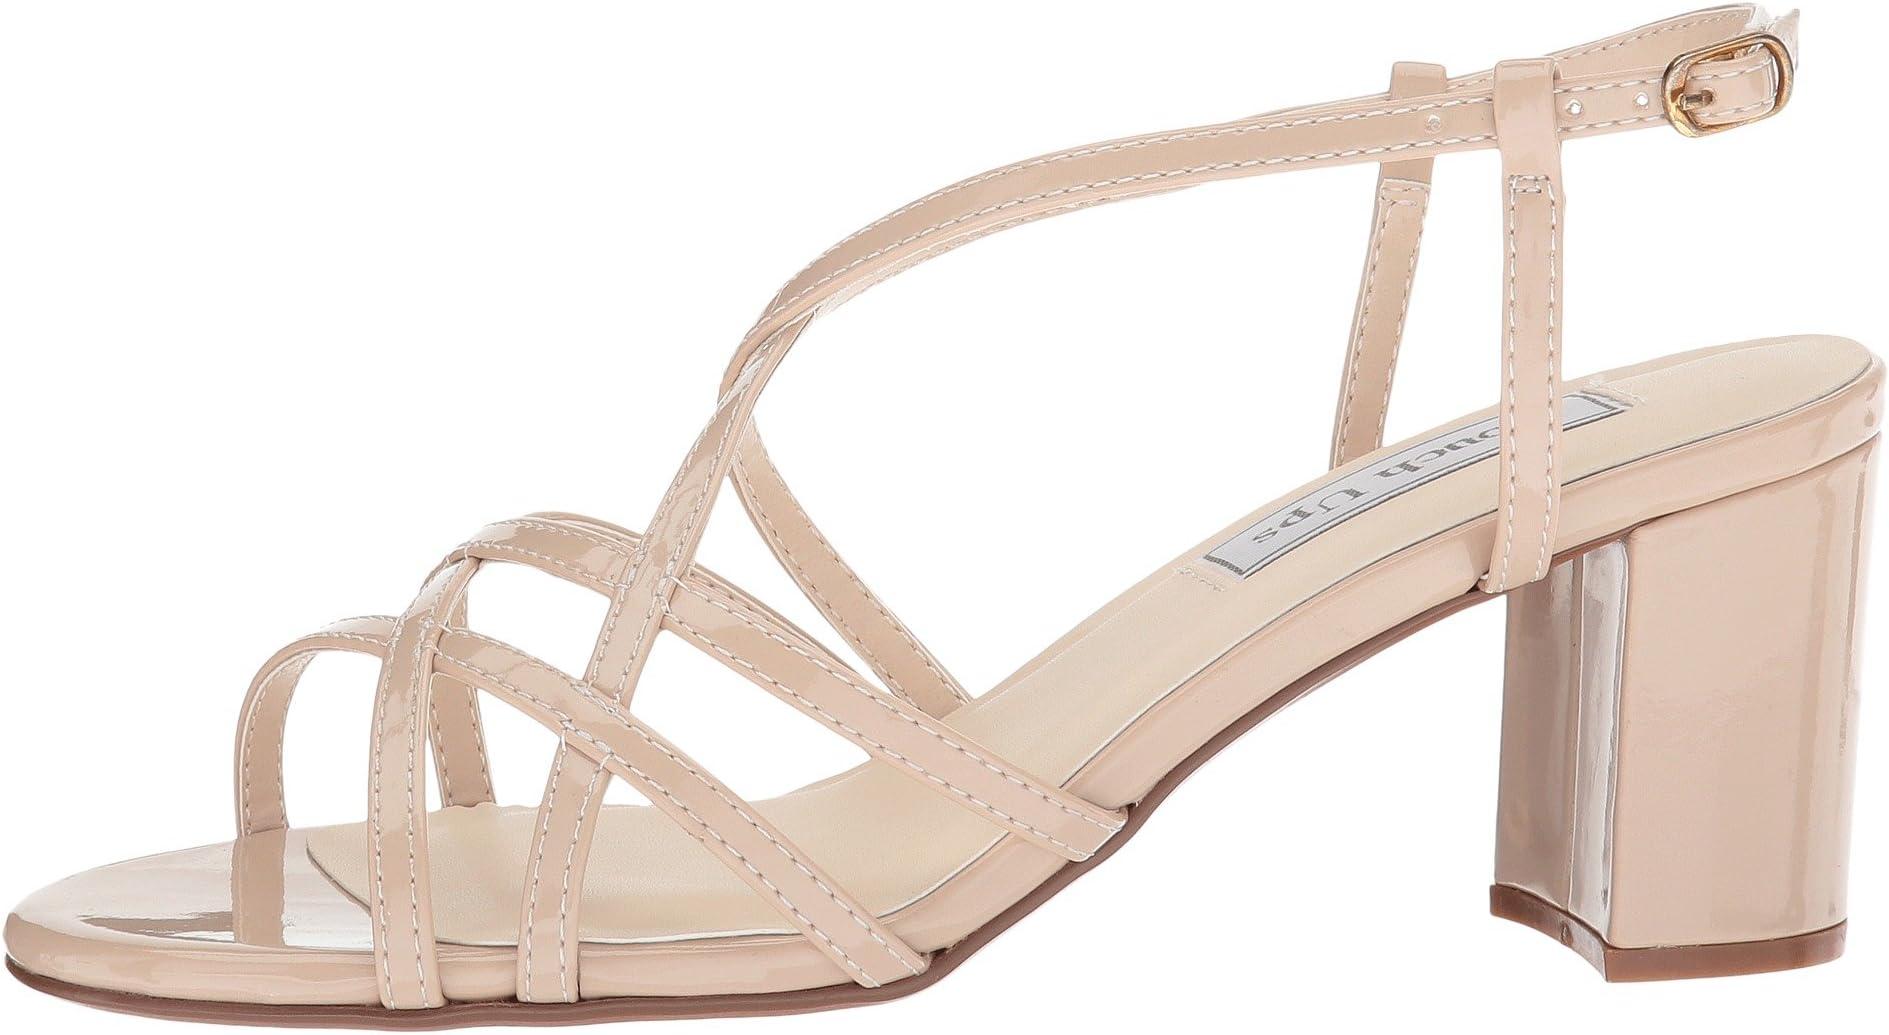 Touch Ups Eva | Women's shoes | 2020 Newest